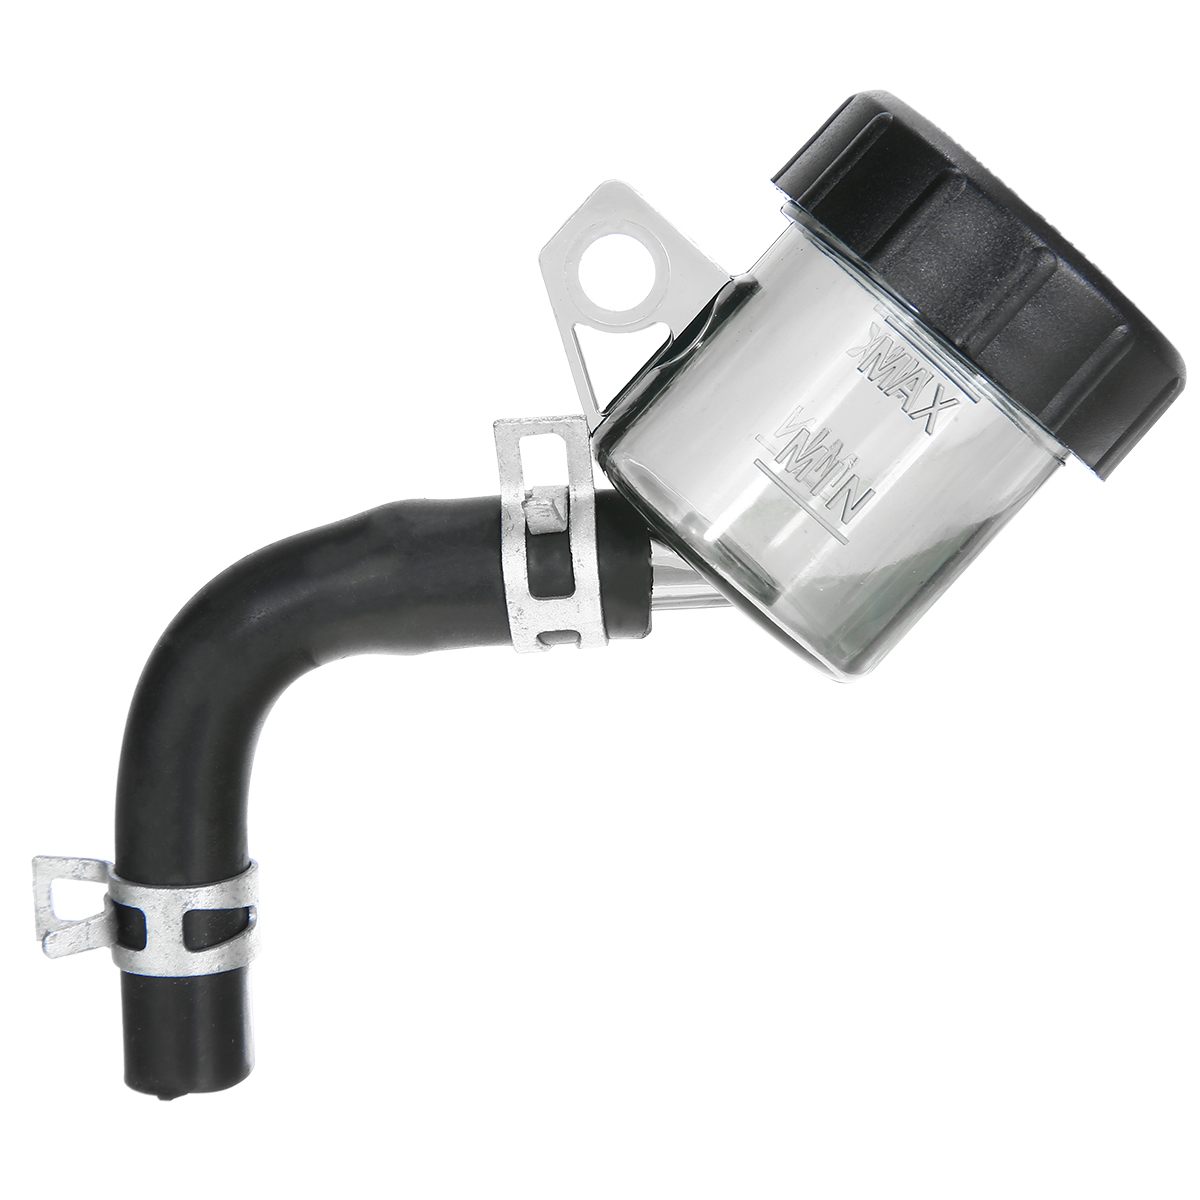 Mayitr 1pc Universal Motocycle Rear Brake Clutch Master Cylinder Fluid Reservoir Oil Tank Cap For Honda